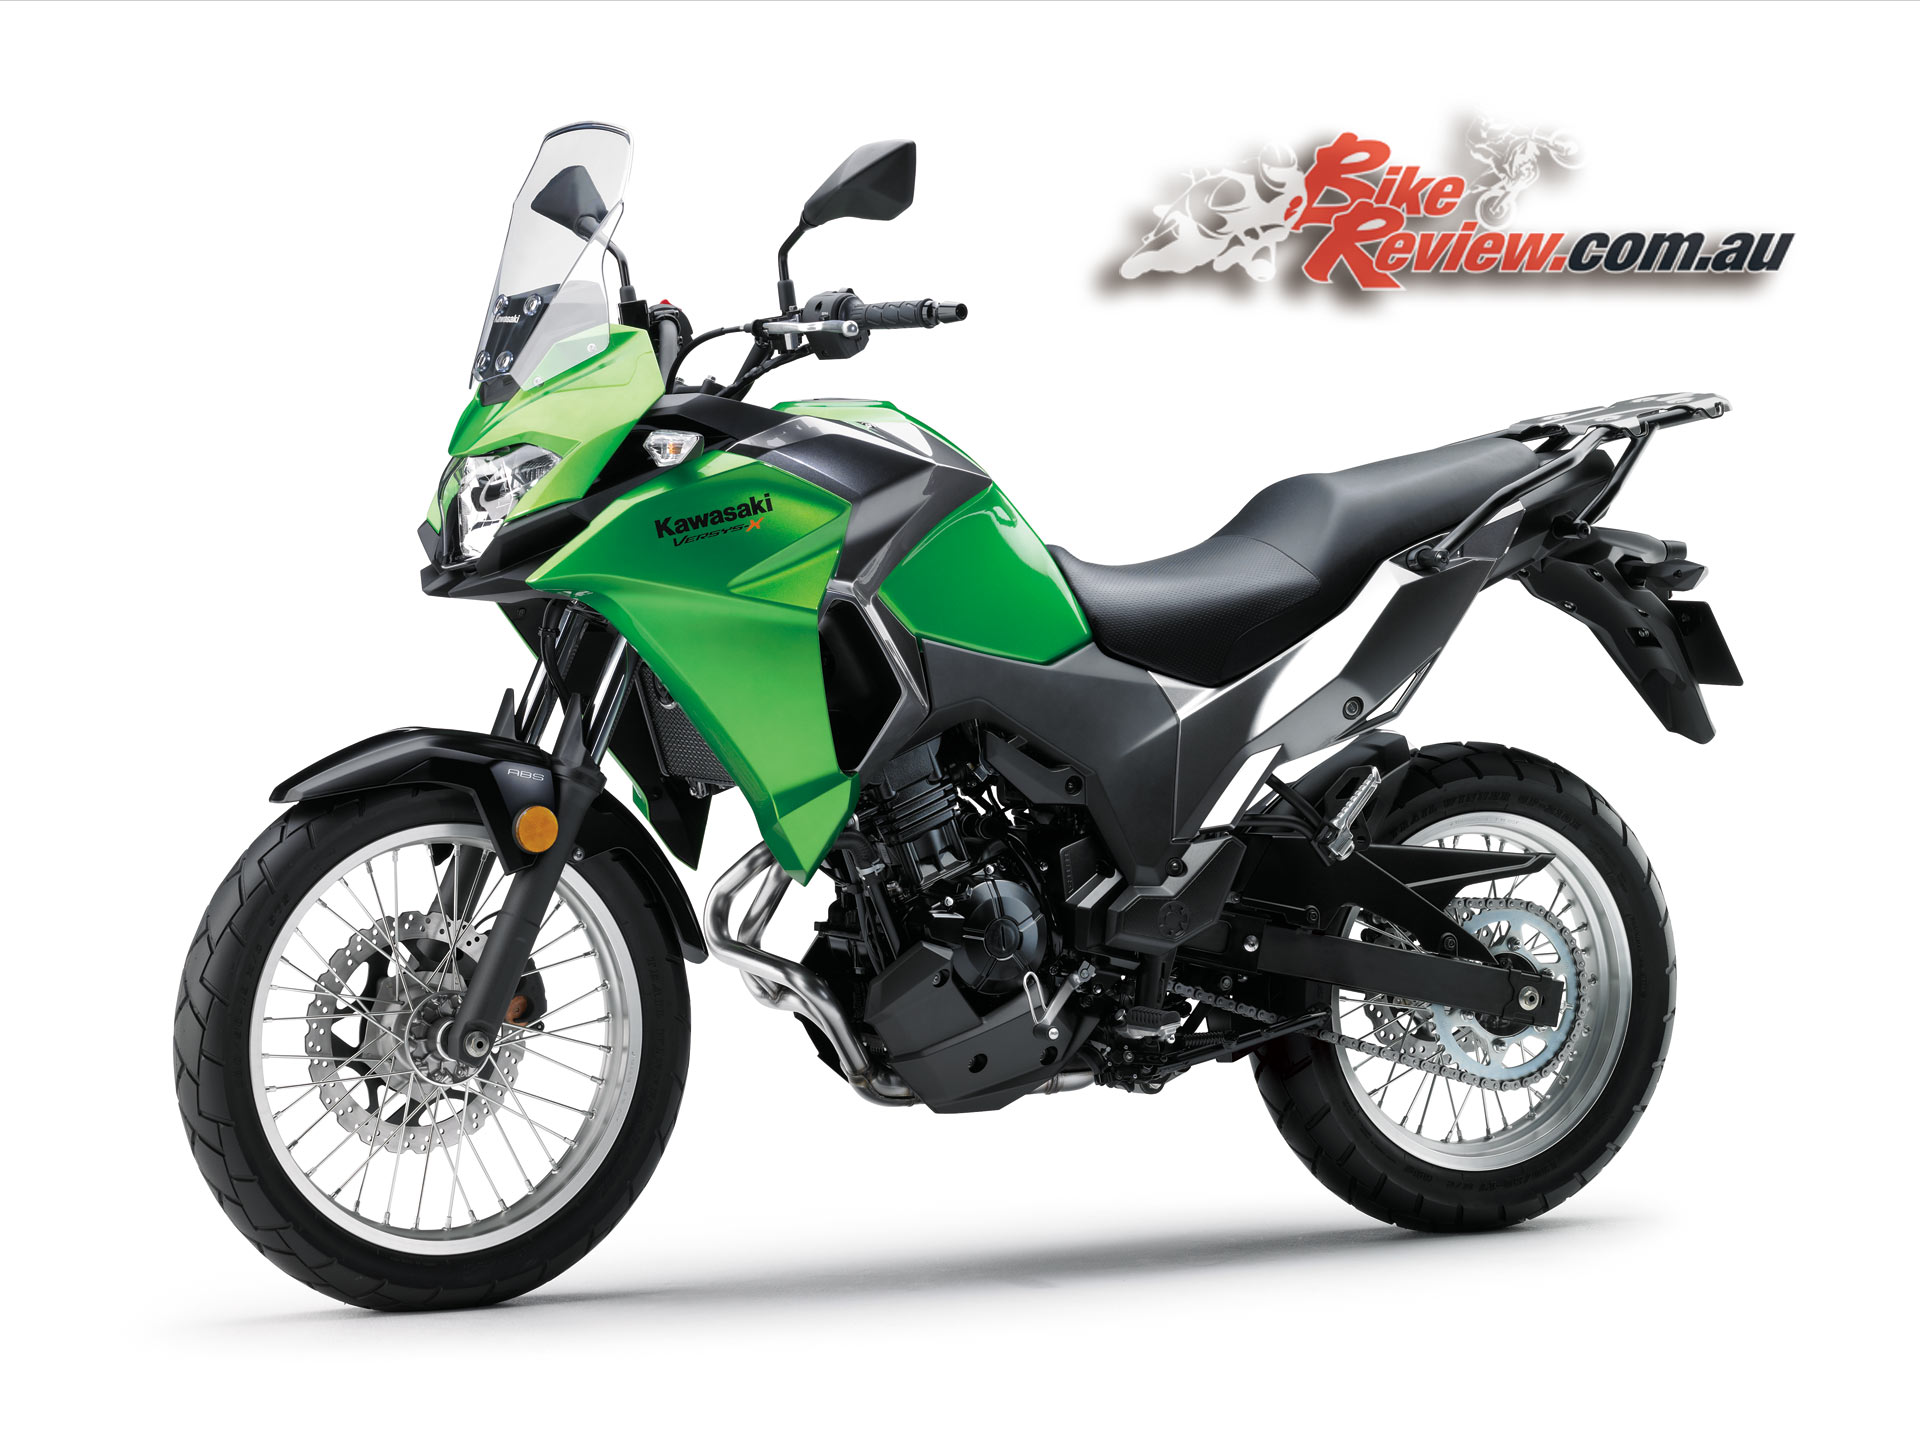 Kawasaki Versys Specs